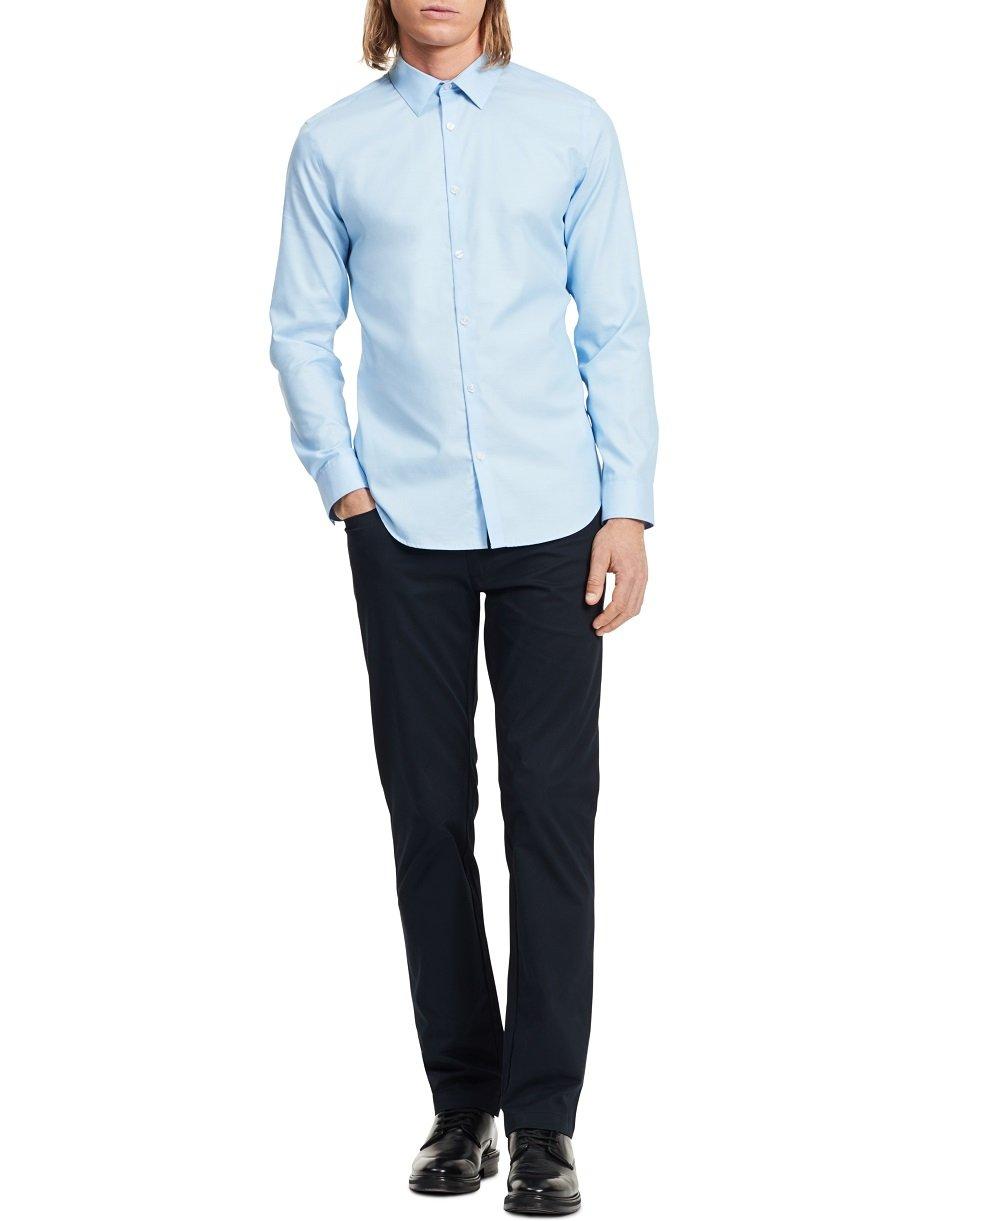 Calvin Klein Infinite Non Iron White Slim Fit Dress Shirt